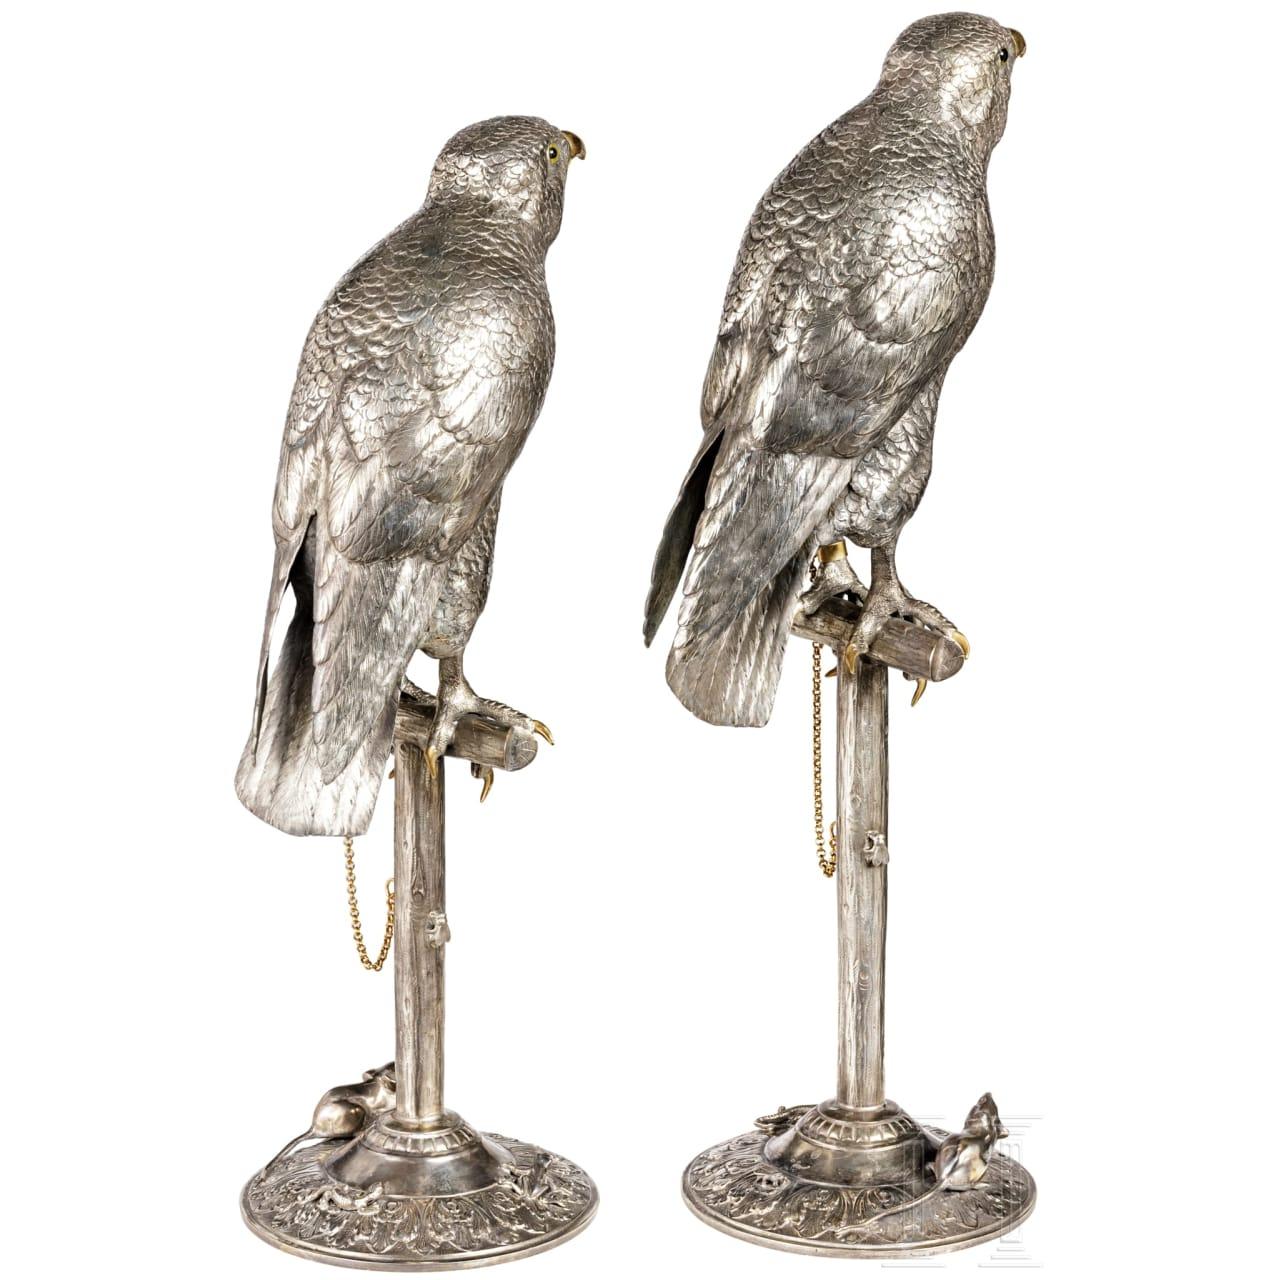 A pair of German silver falcons, circa 1900